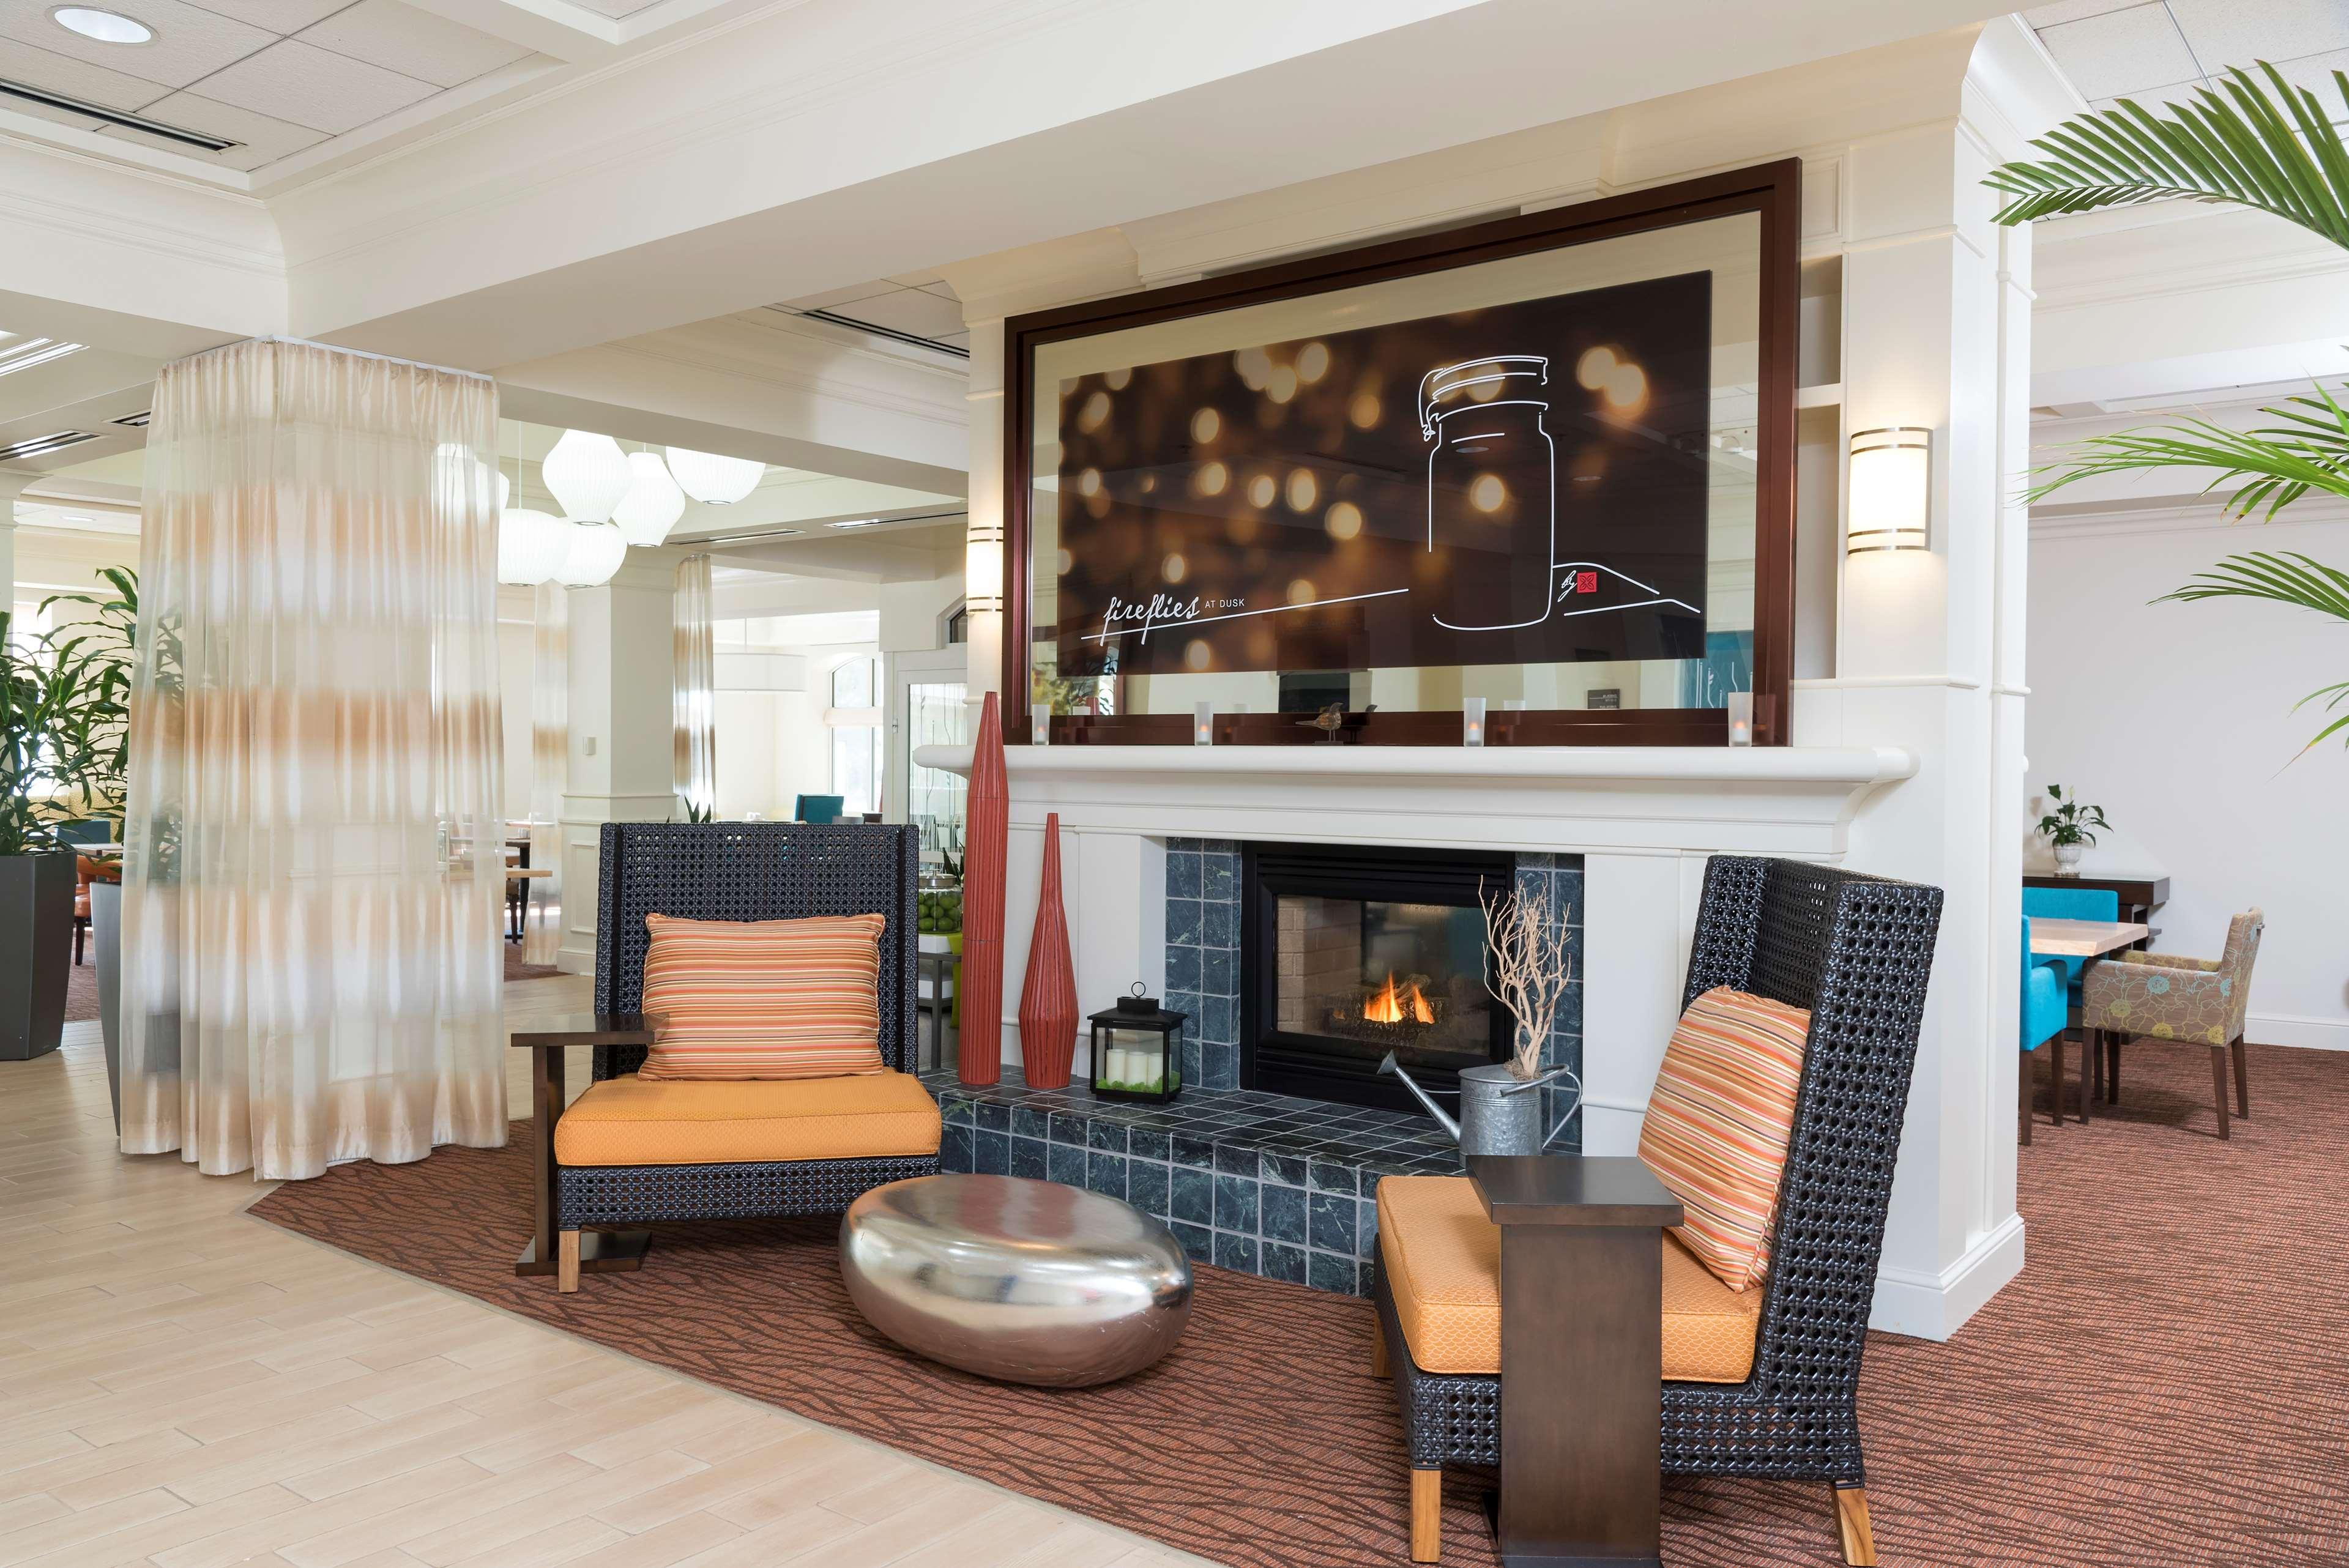 Hilton Garden Inn West Lafayette Wabash Landing image 2